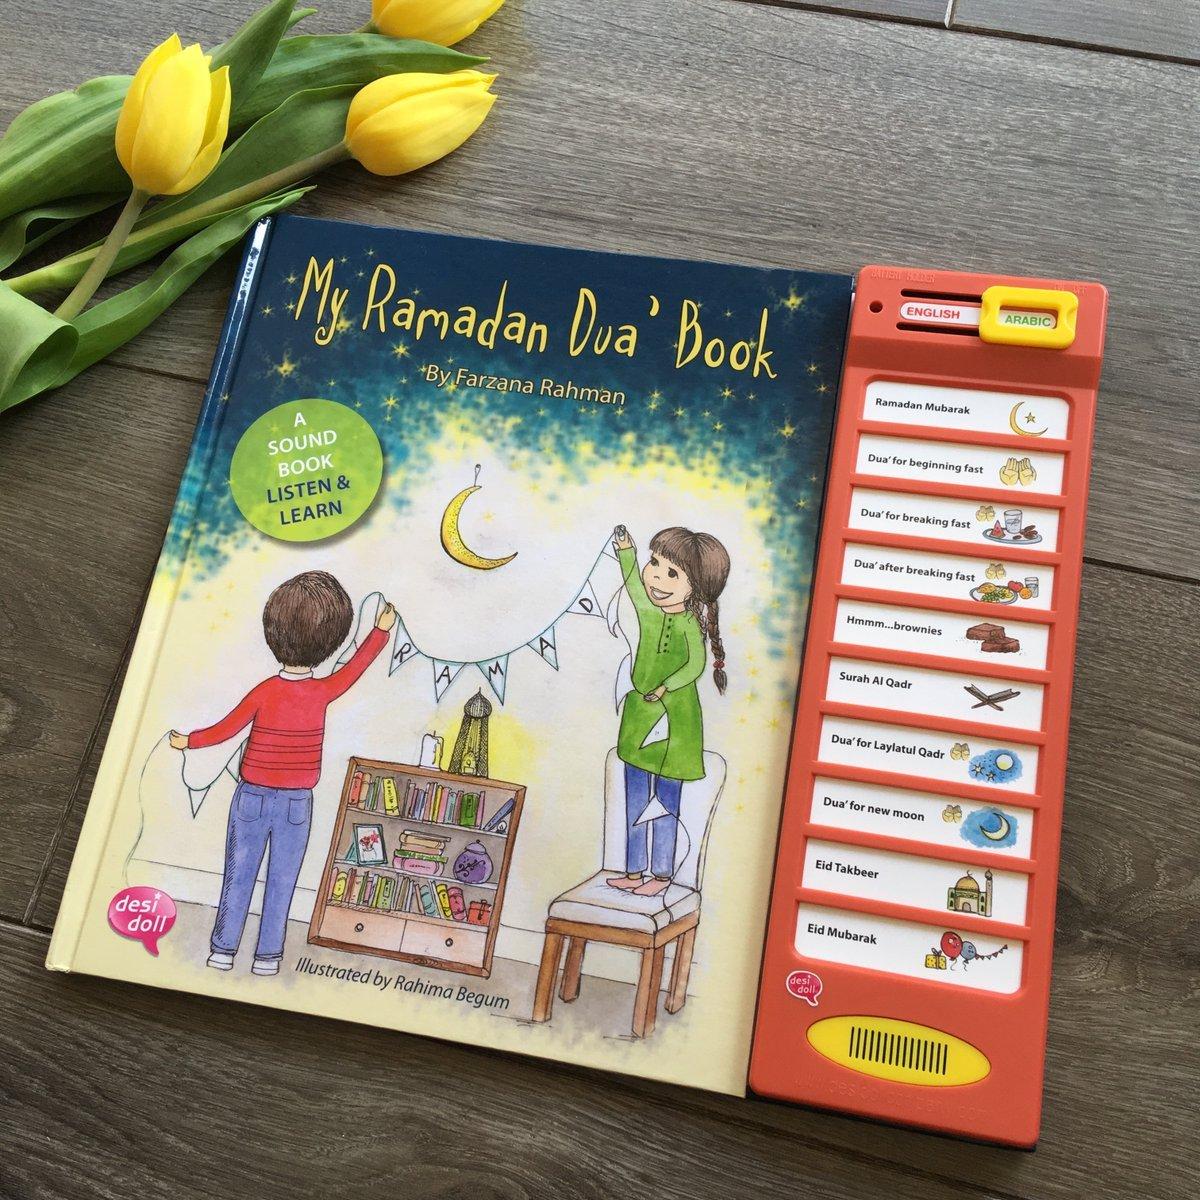 Book Review: My Ramadan Dua' Book